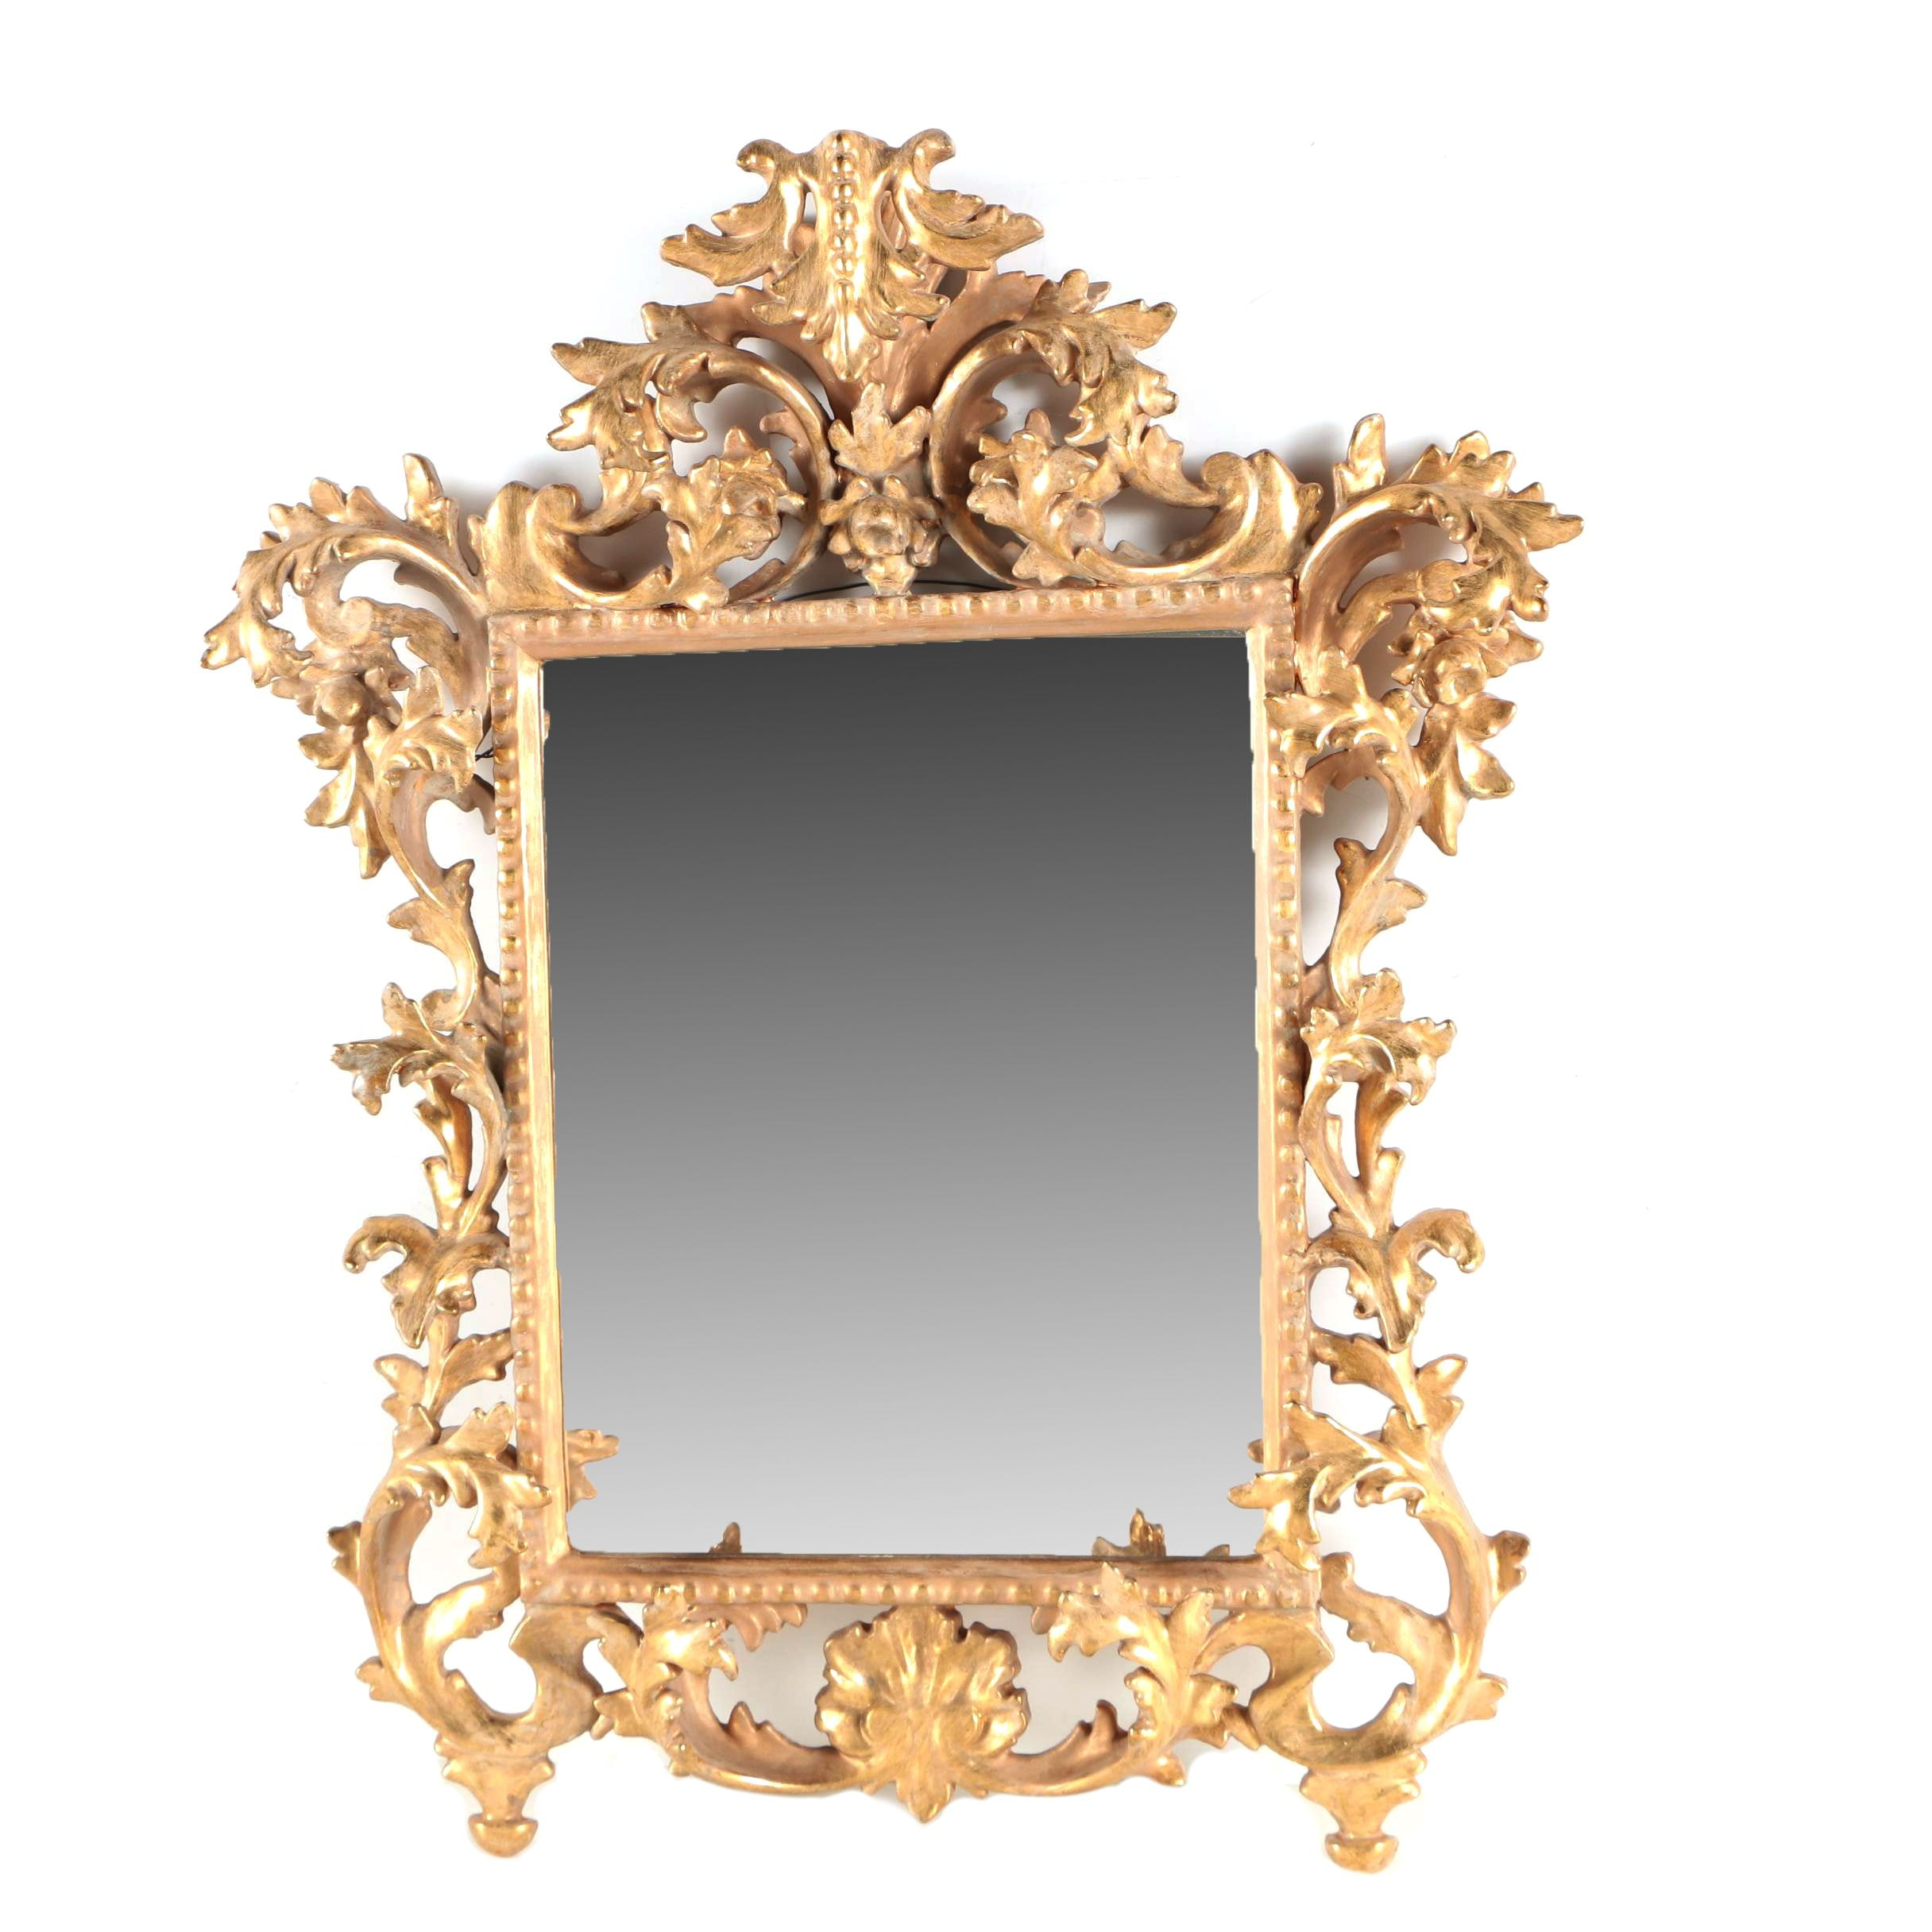 Contemporary Baroque Style Wall Mirror